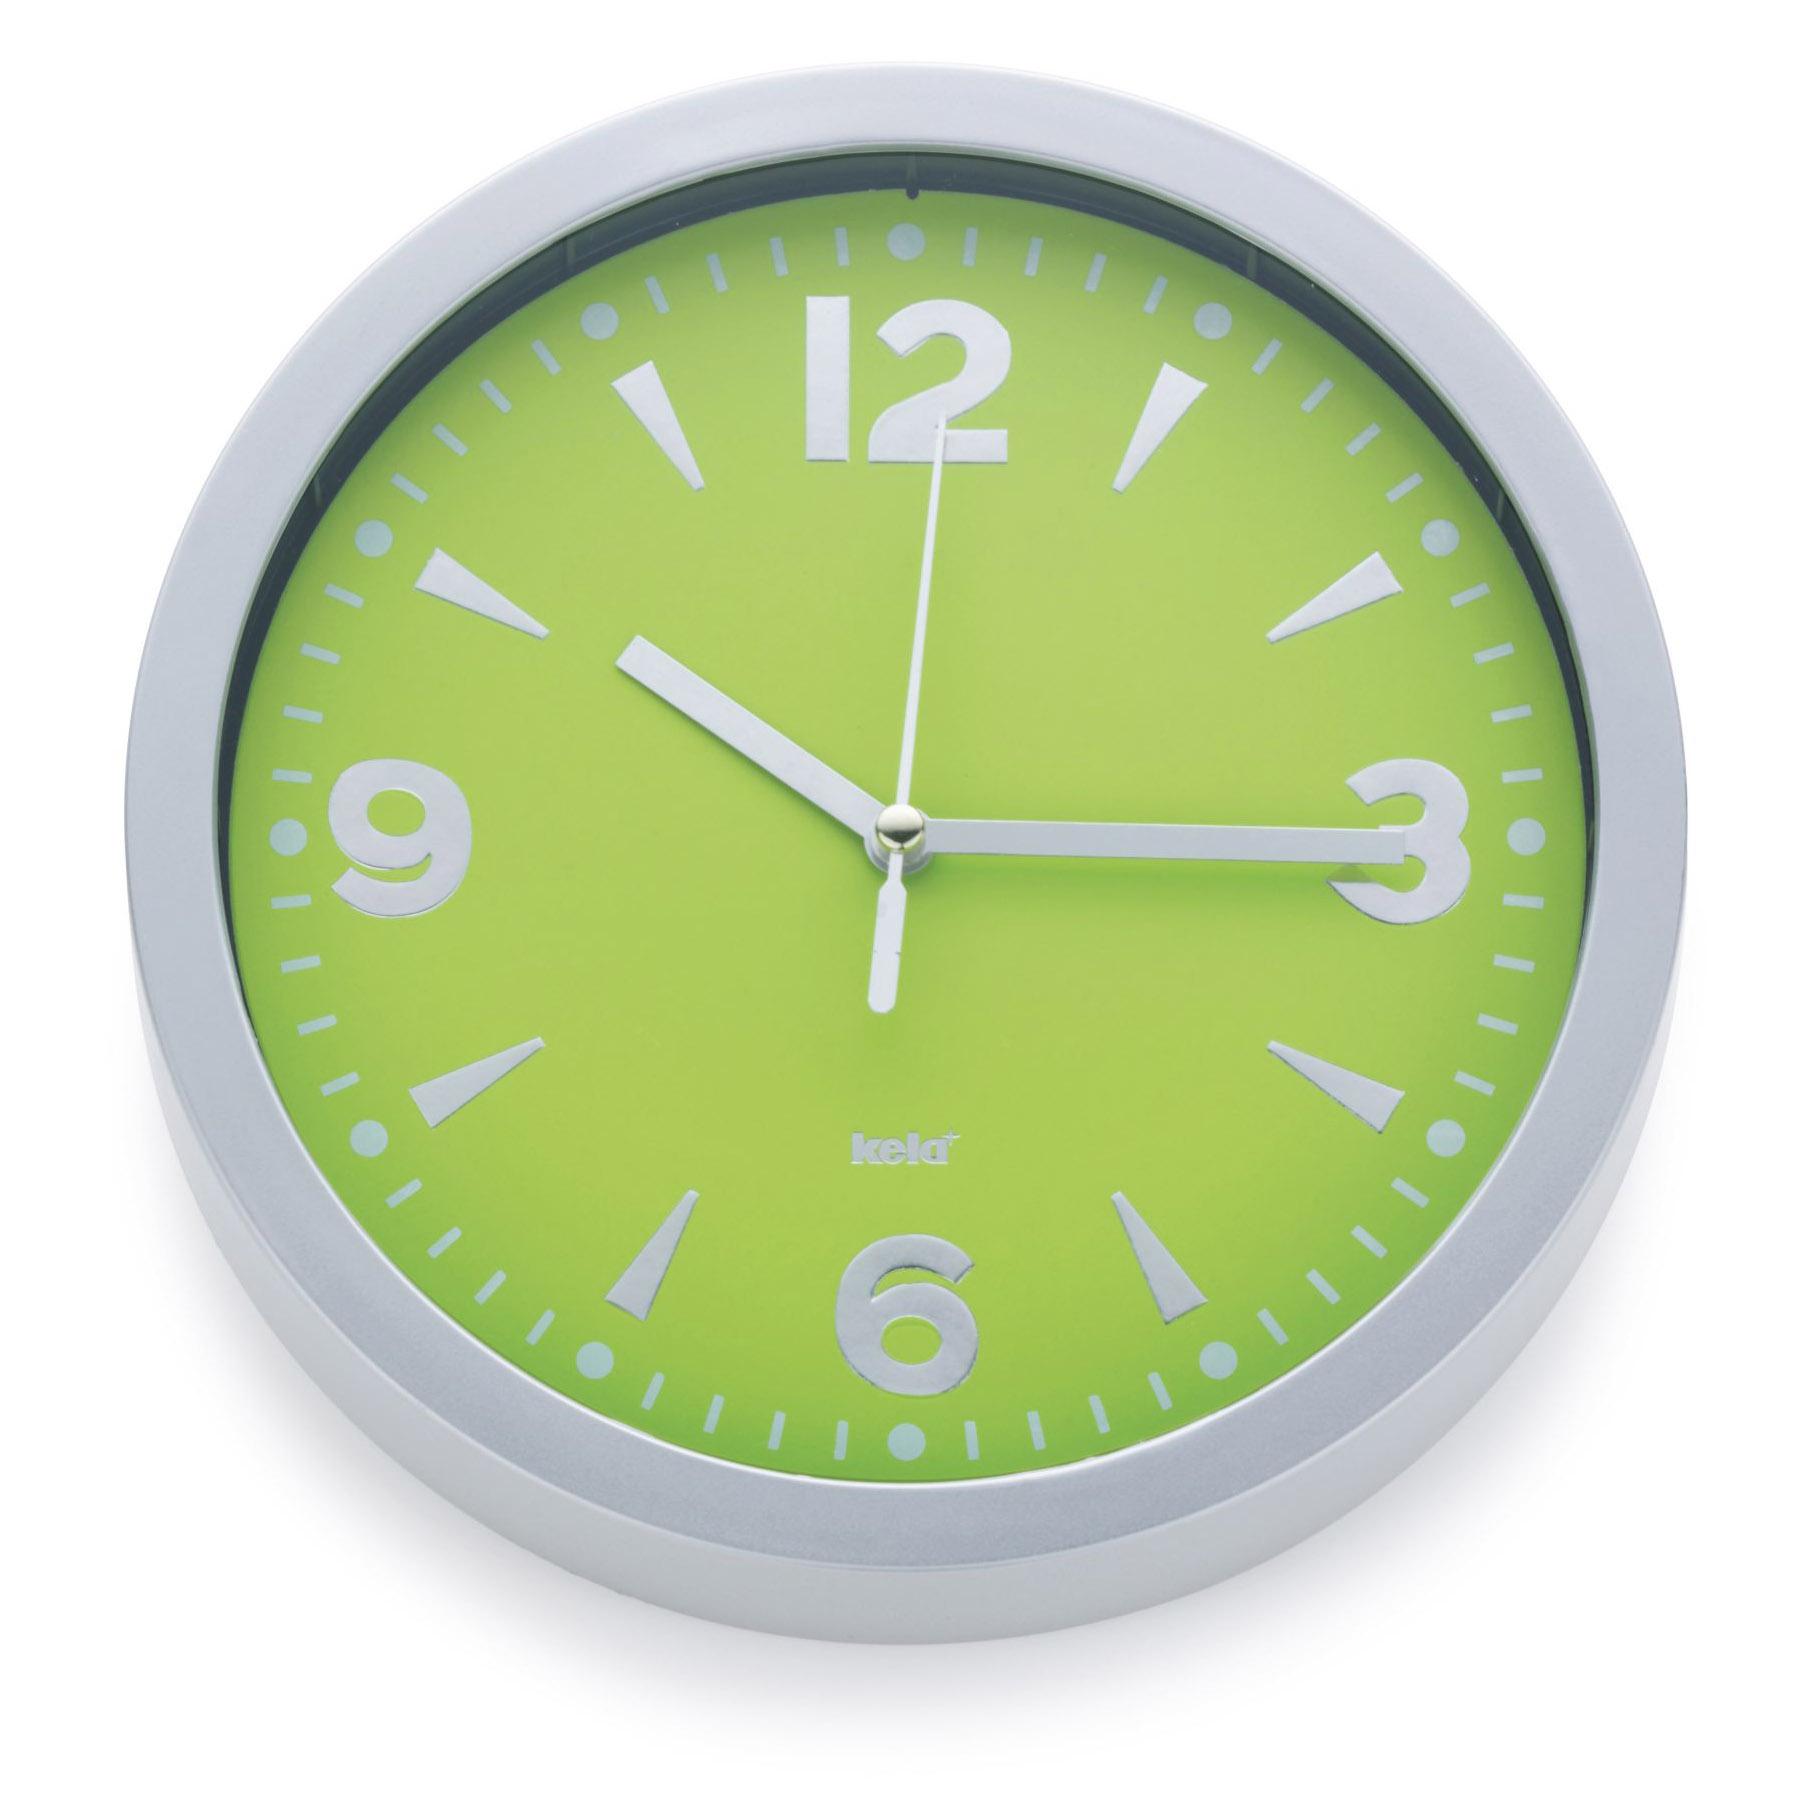 Kela Design Horloge Murale de Salle Bain Cuisine Gare Salon | eBay